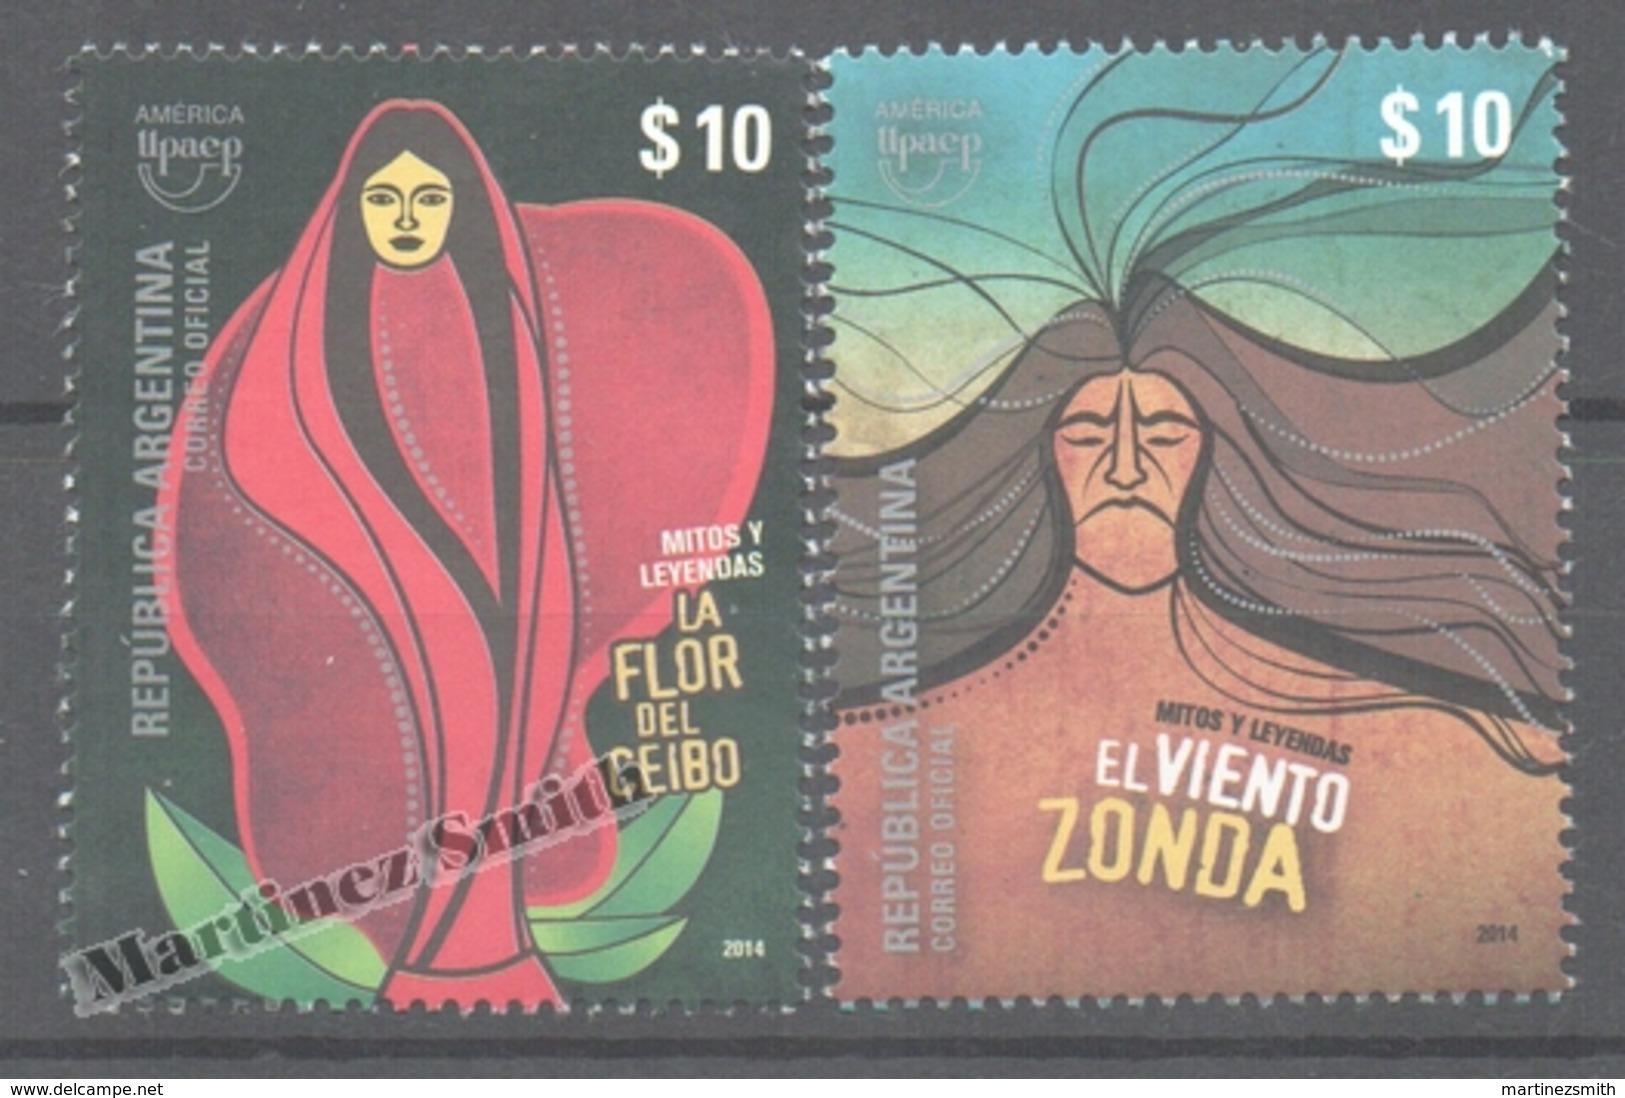 Argentina 2014 Yvert 3044- 45, America UPAEP, Myths And Legends  - MNH - Neufs